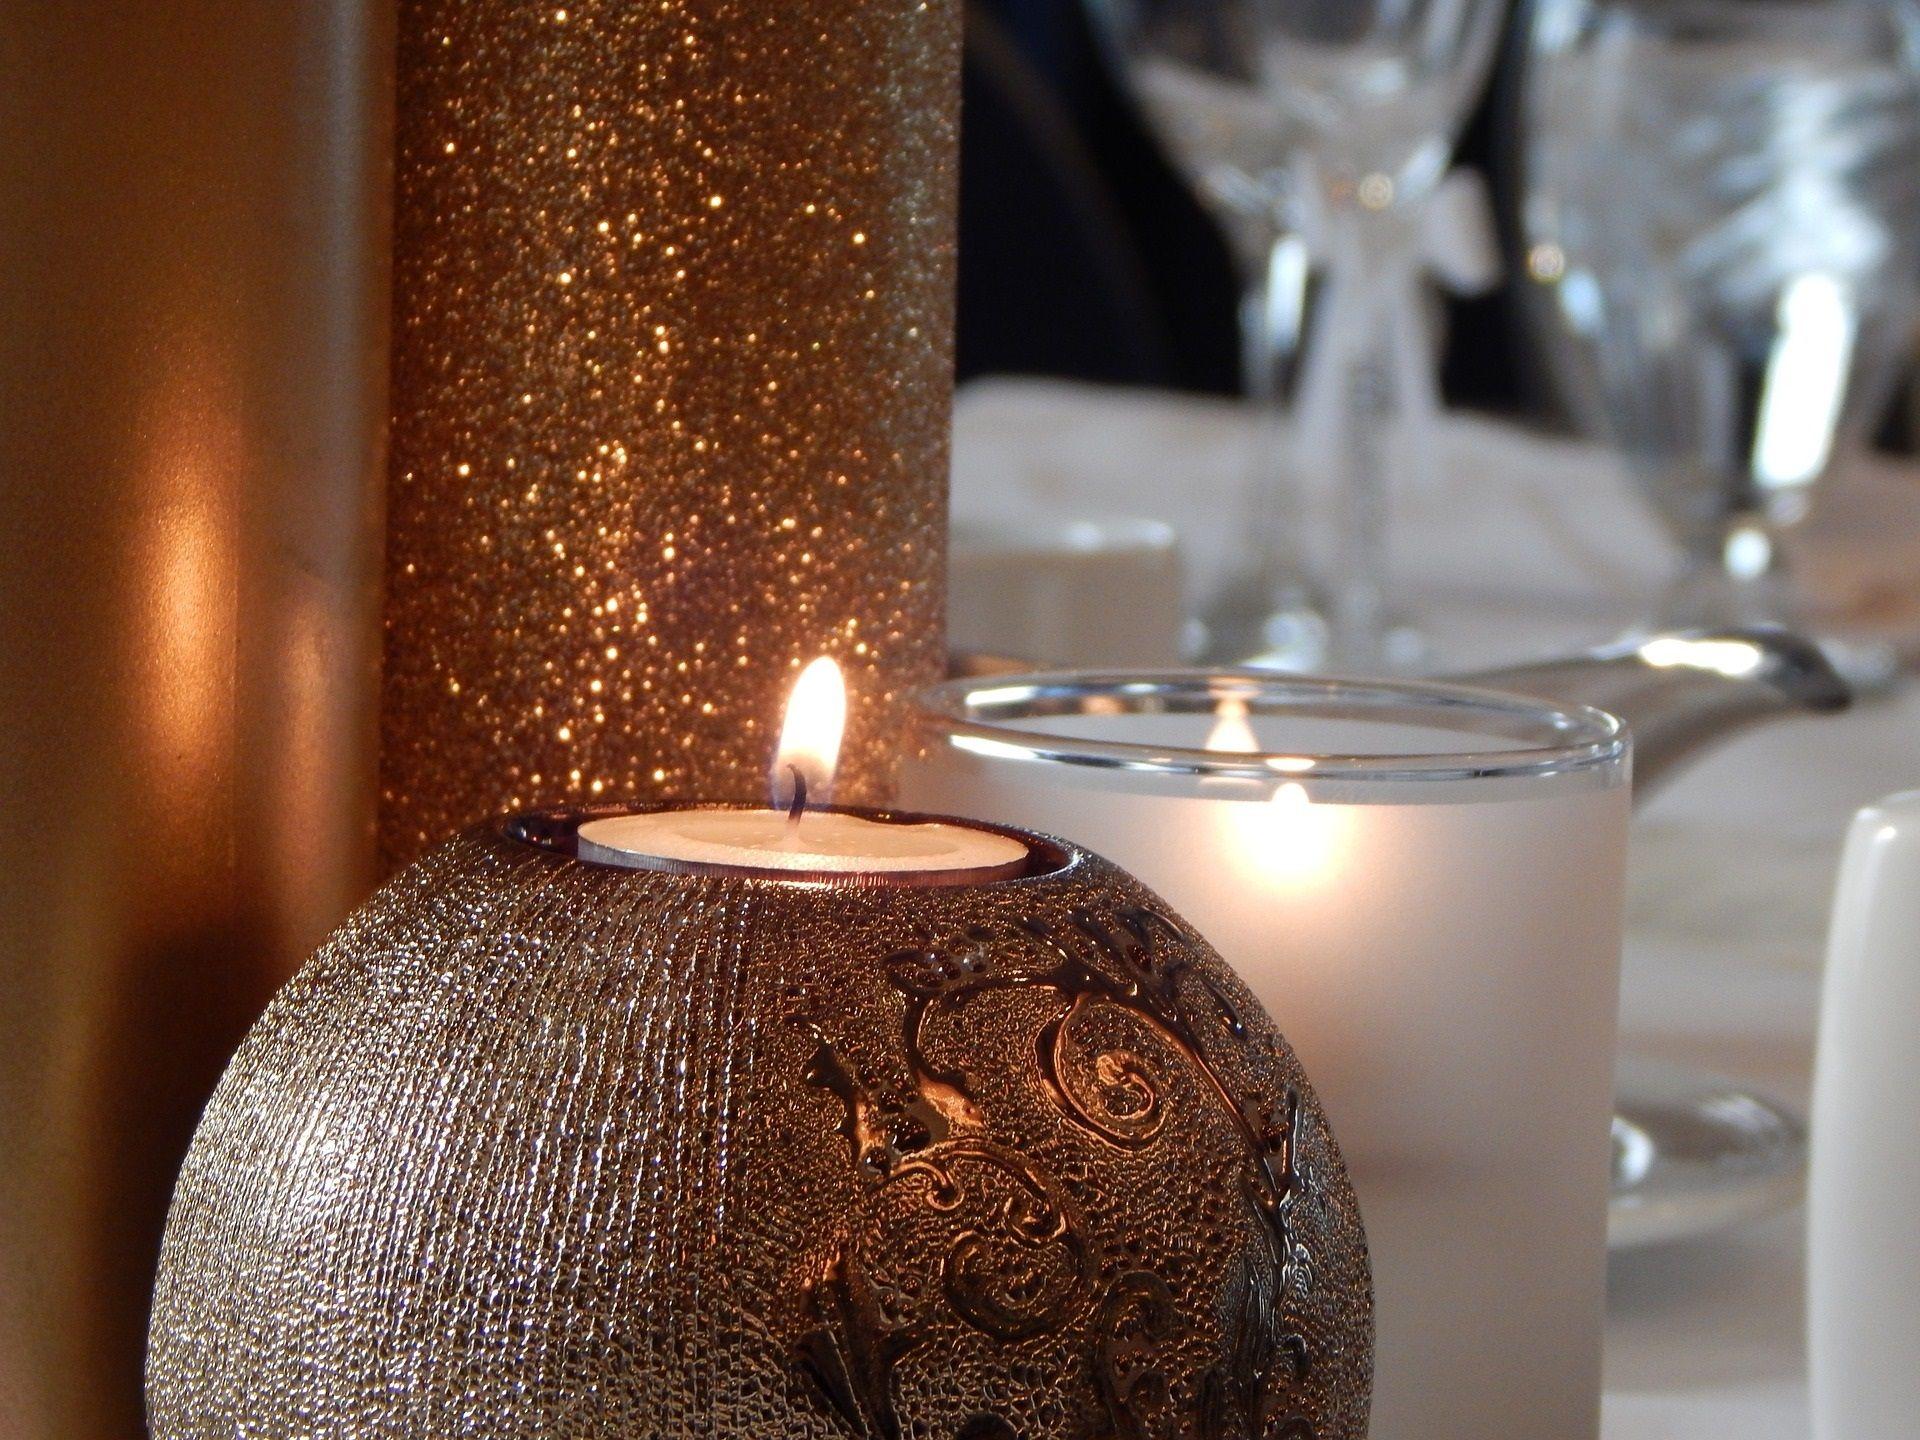 Kerzen Glas Spiegel Hochzeitstrends 2019 In 2020 Kerzen